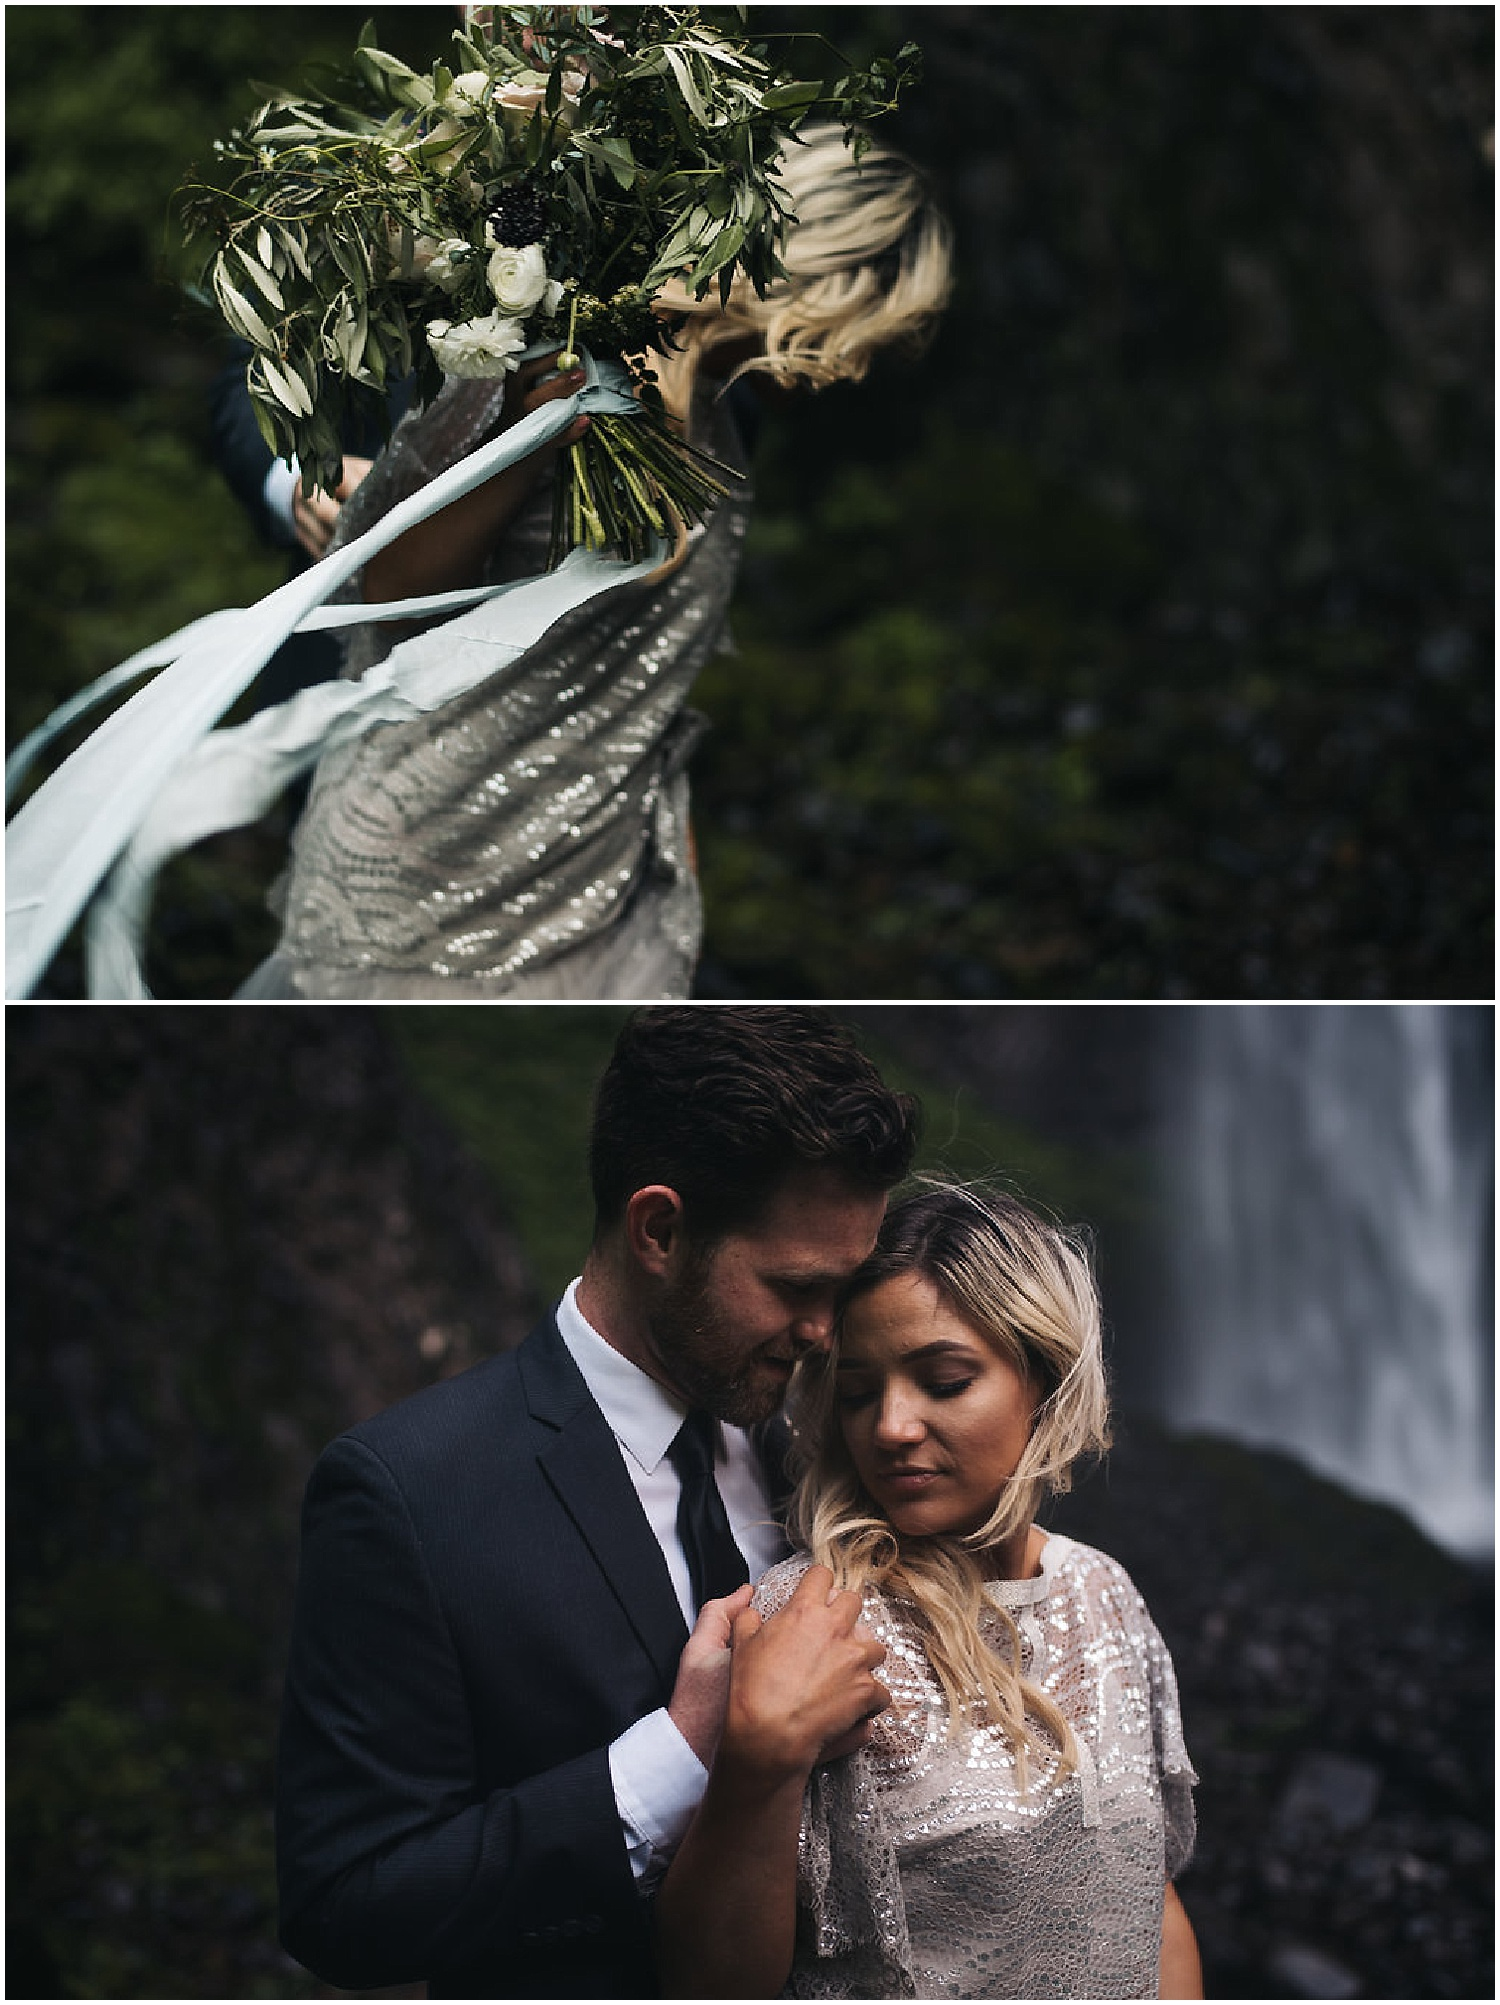 wind blown bridal bouquet